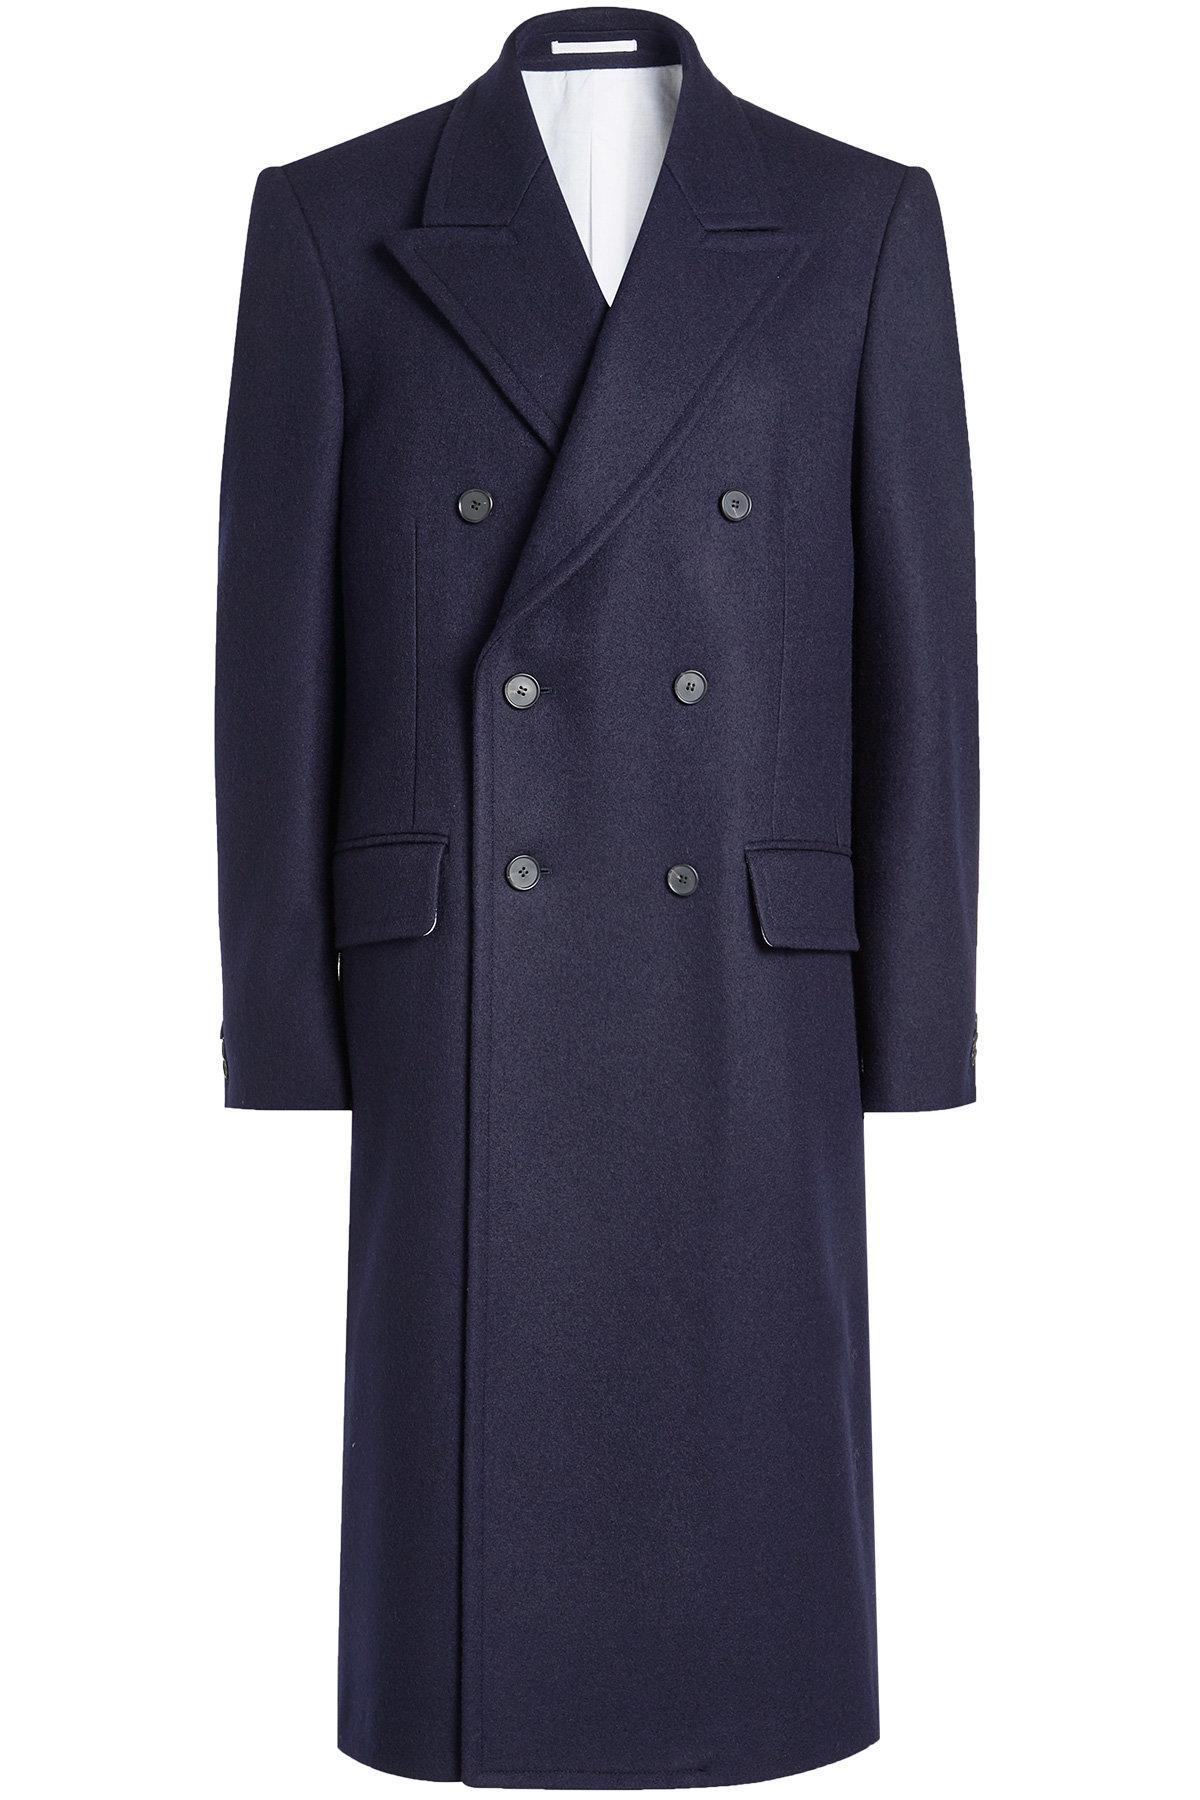 Calvin Klein 205W39Nyc Wool Coat In Blue